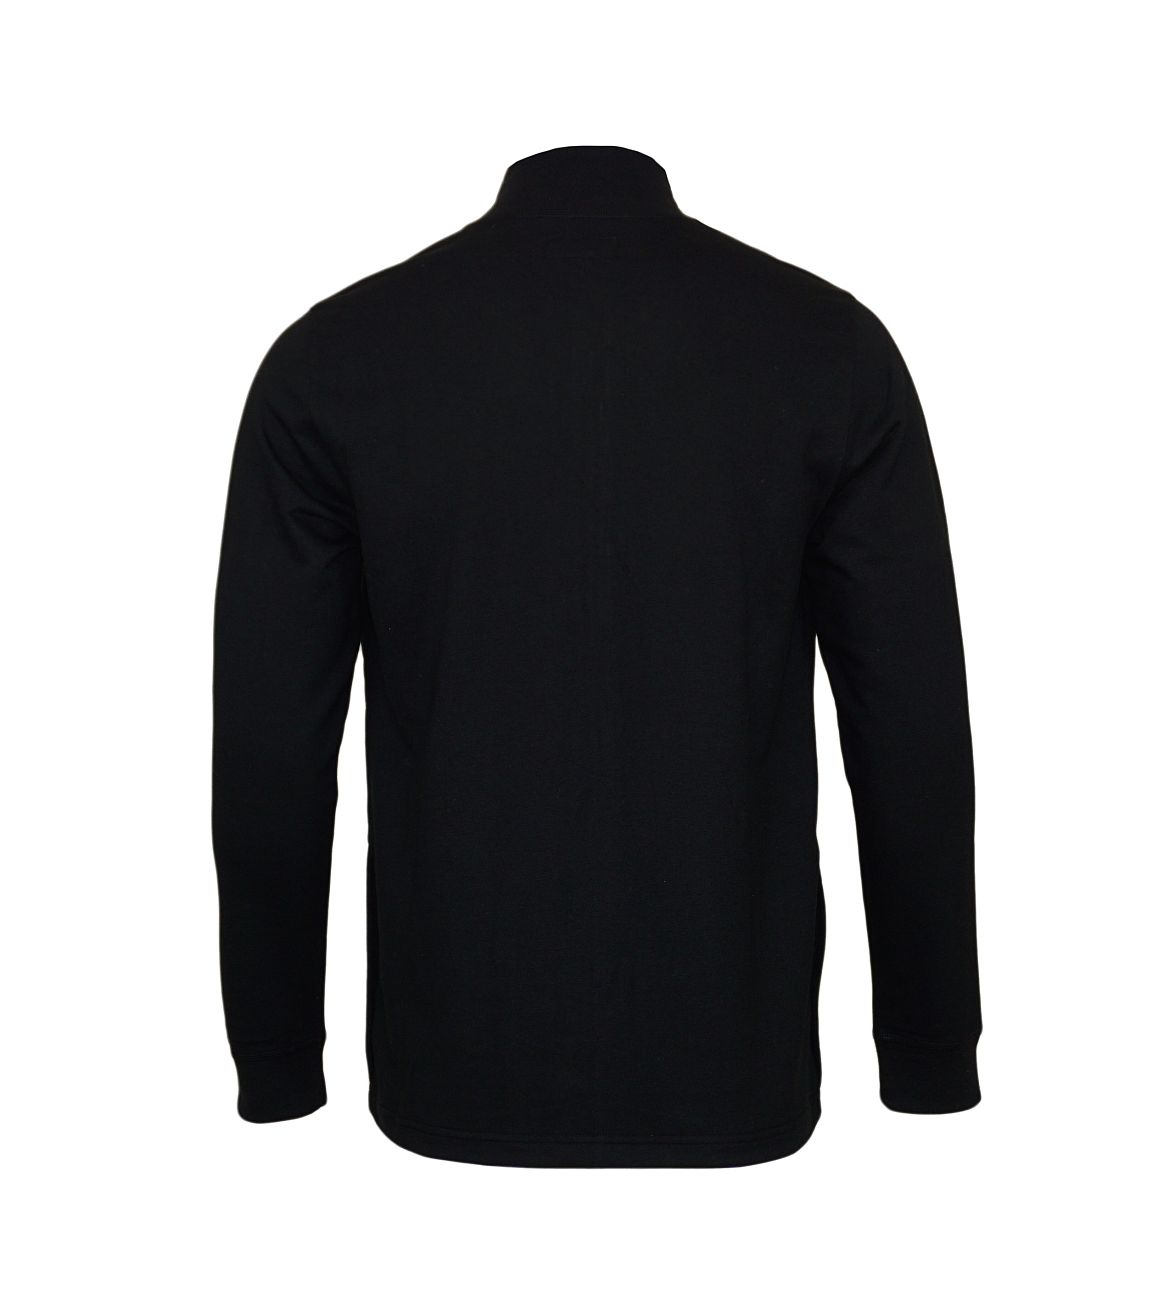 Ralph Lauren Jacke Sweater Zipper 714686862003 black S18-RLZ1